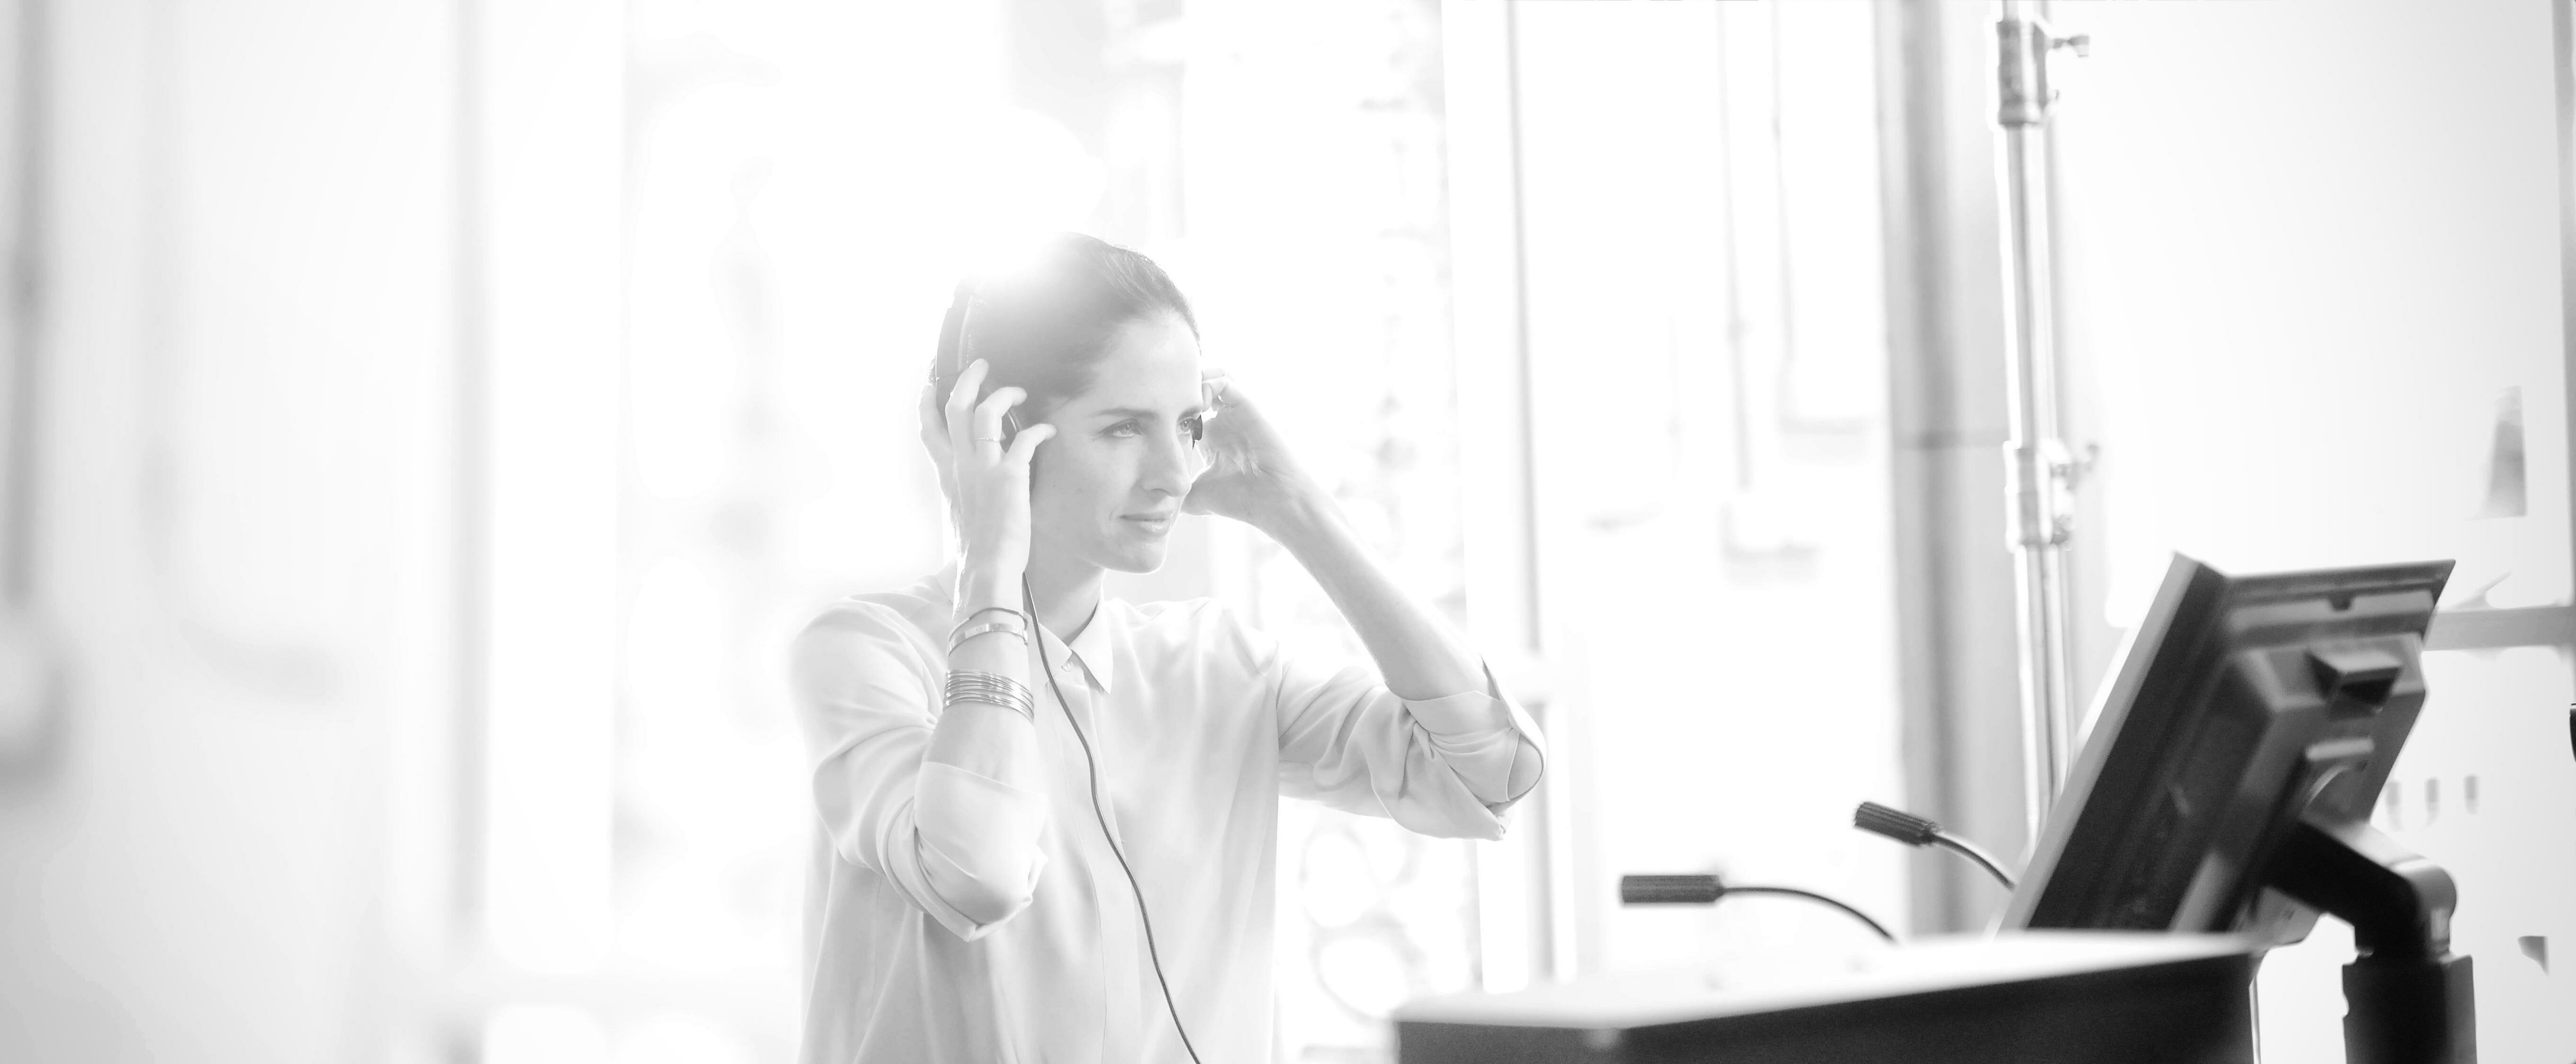 CHPINK16_MakingOf_CHDB with headphones_BW